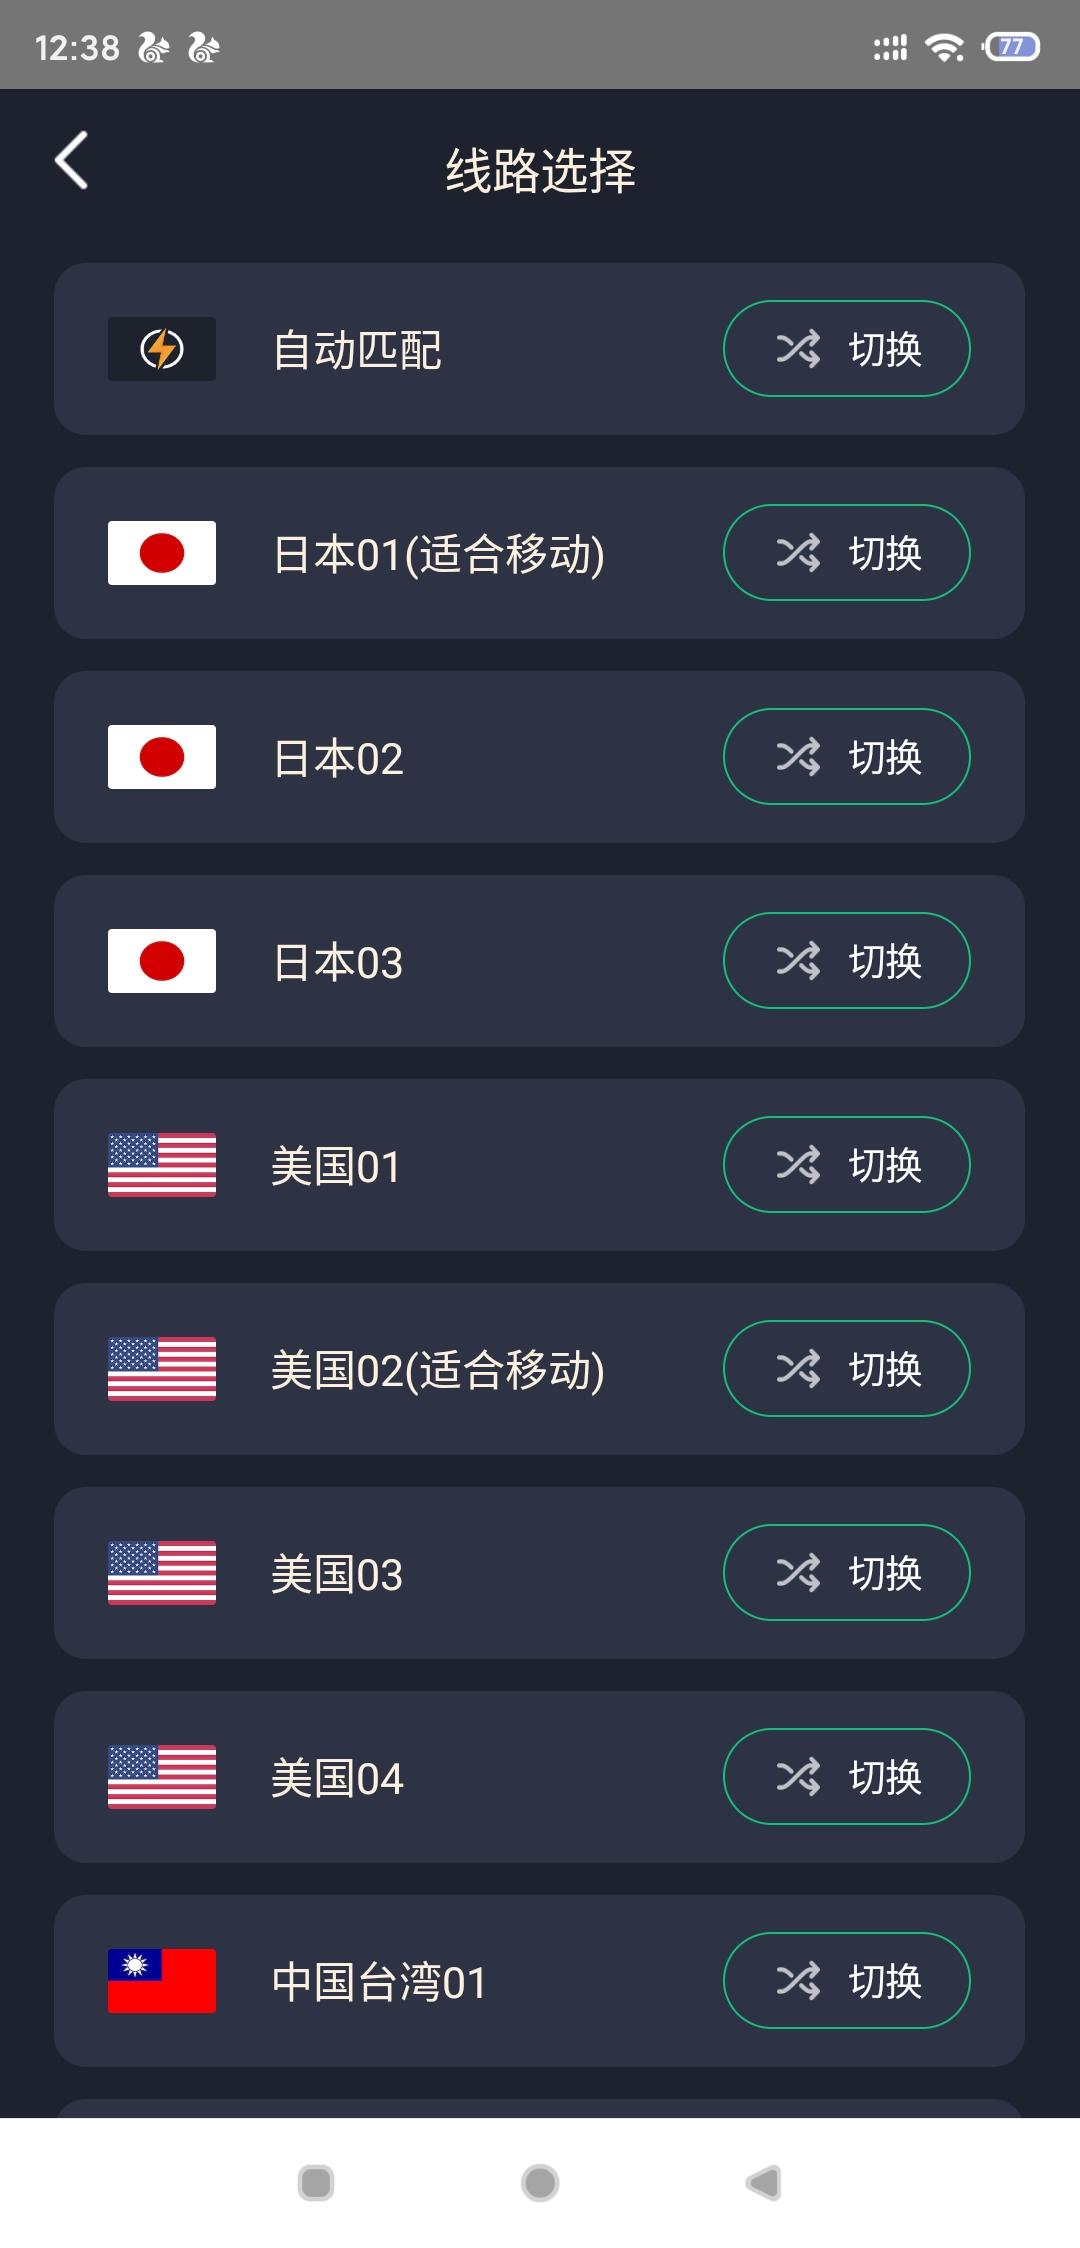 https://file.bayunhome.com/attachment/2020/6_27/4e1d02f13b7e44d998a21b8a0a8e5319.jpg